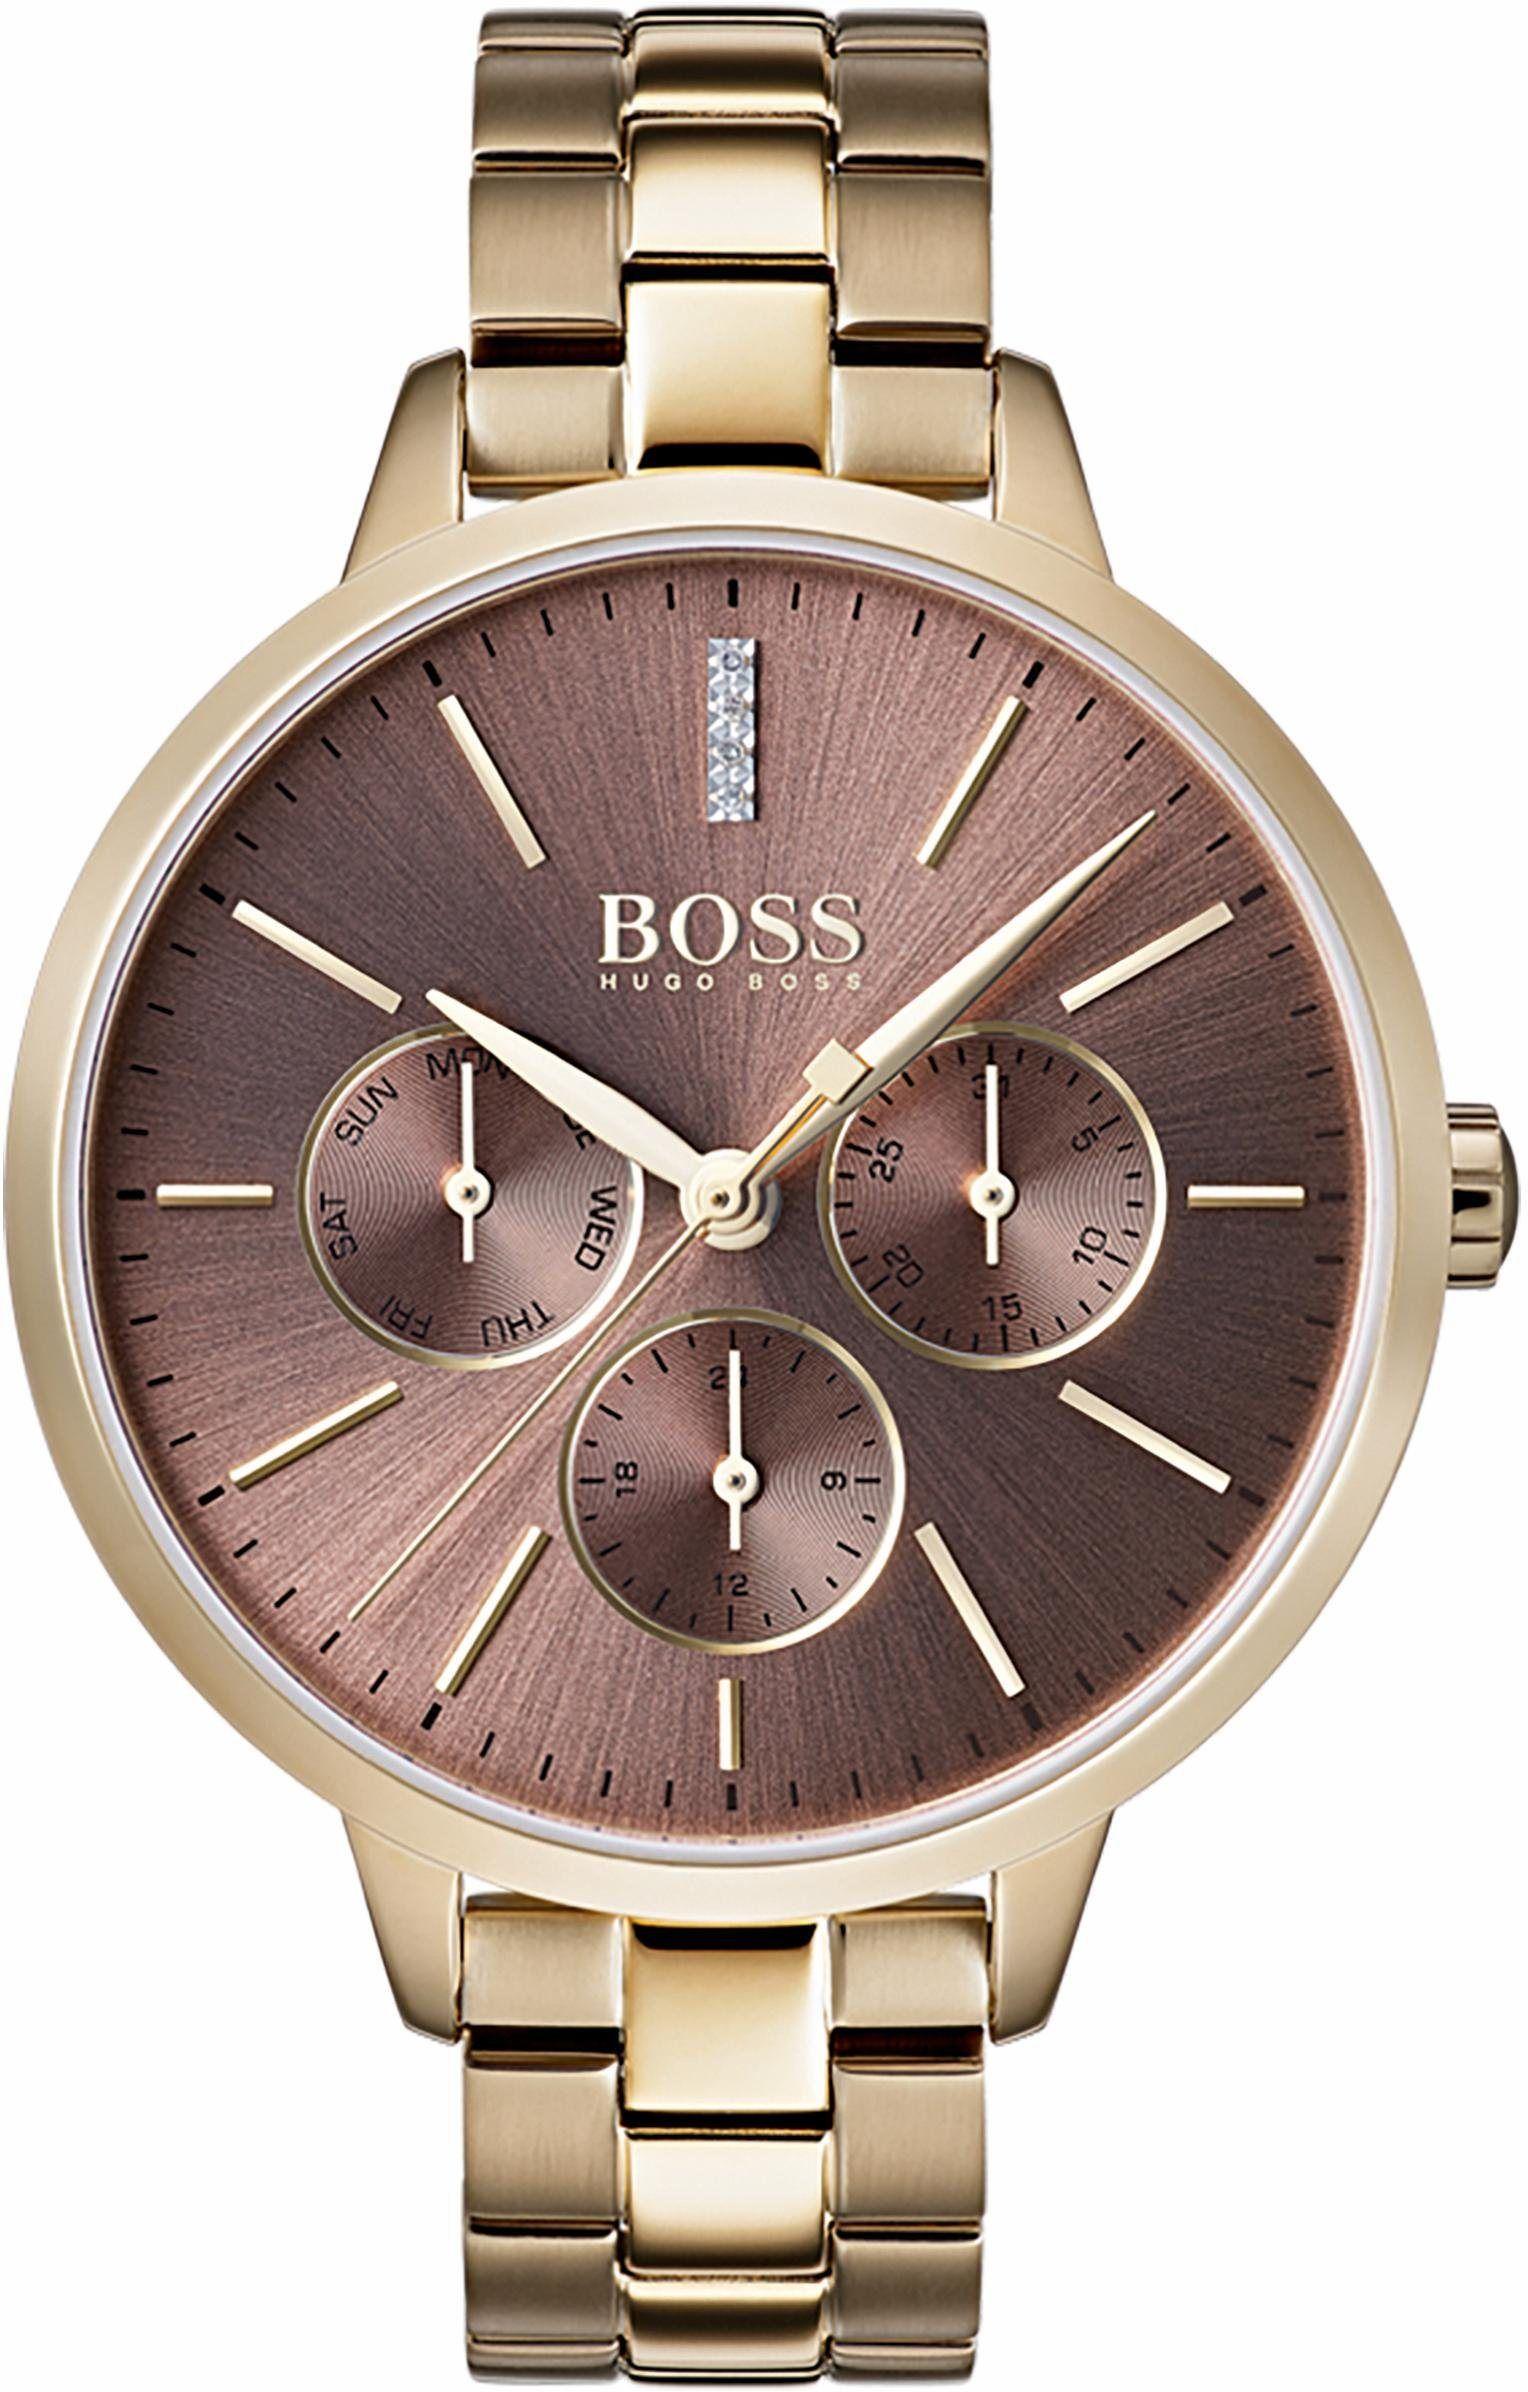 Boss Multifunktionsuhr Symphony 1502422 Jetzt Bestellen Unter Https Mode Ladendirekt De Herren Uhren Multifunktionsuhre Relojes Hugo Boss Hugo Boss Reloj